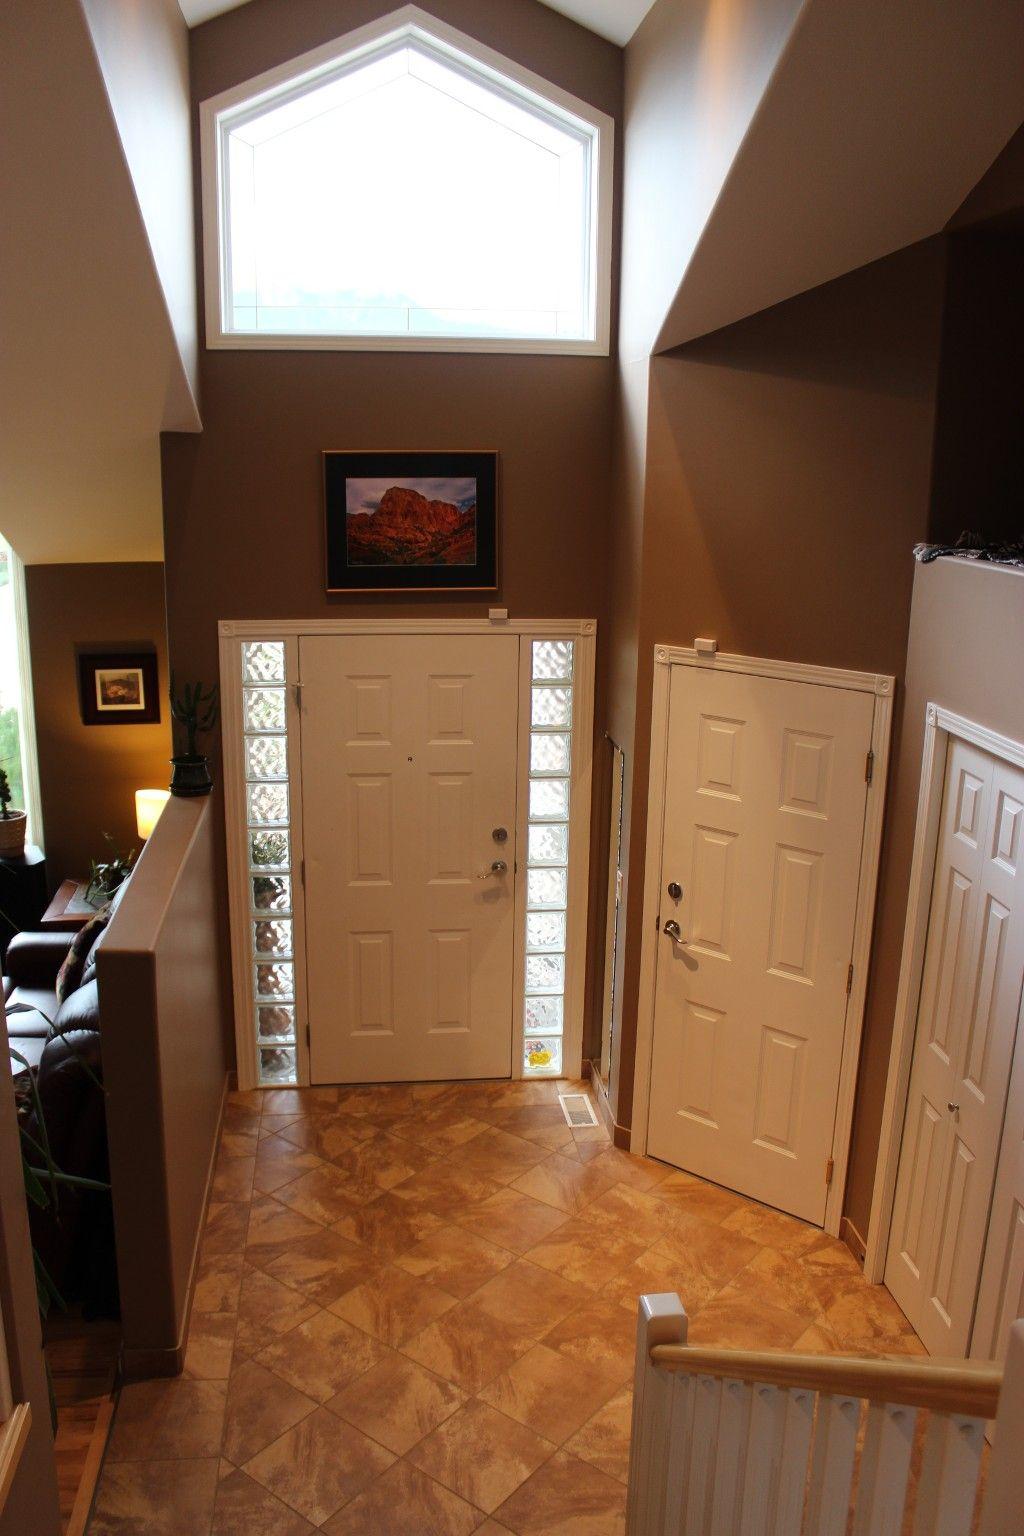 Photo 2: Photos: 3581 Navatanee Drive in Kamloops: Rivershore Estates House for sale : MLS®# 117351